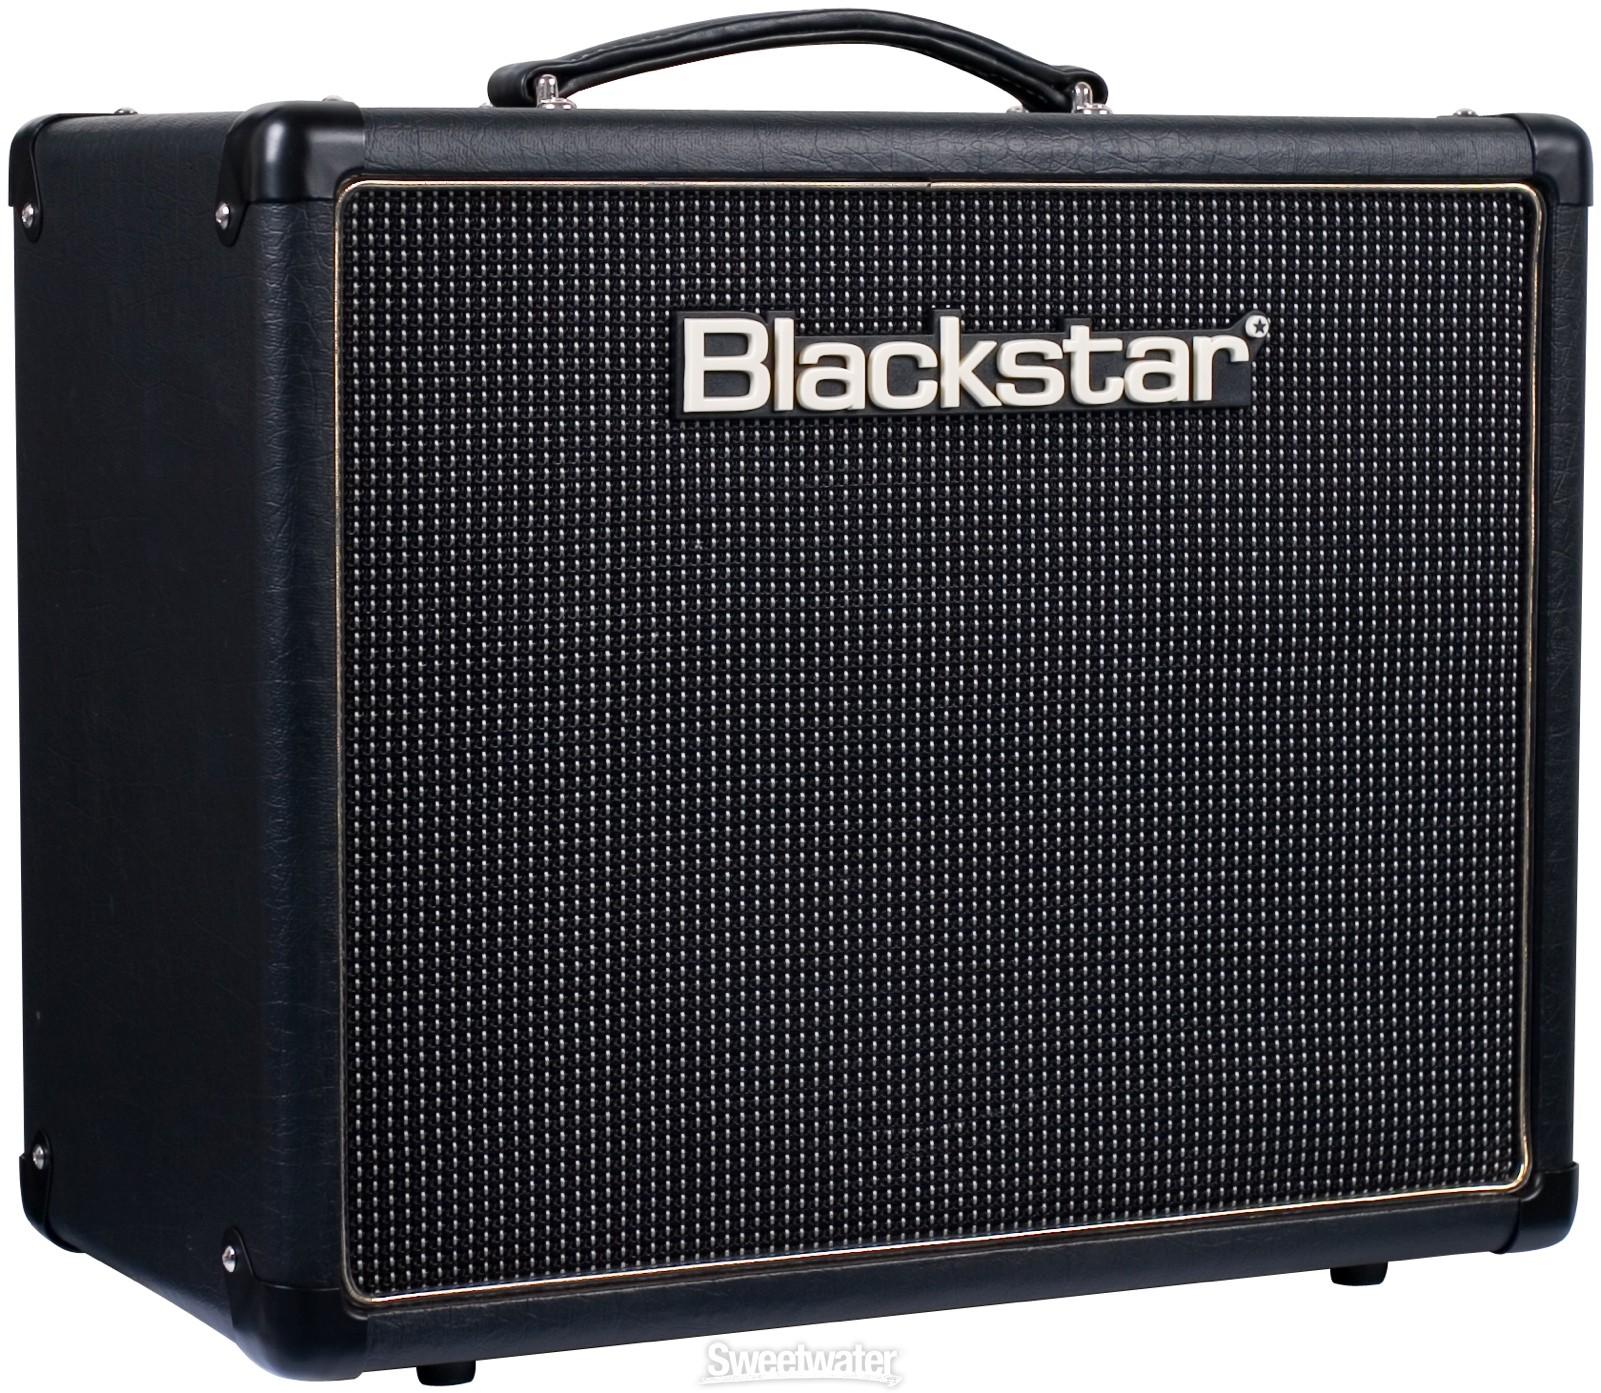 achat guitare blackstar en stock chez star s music revendeur blackstar. Black Bedroom Furniture Sets. Home Design Ideas